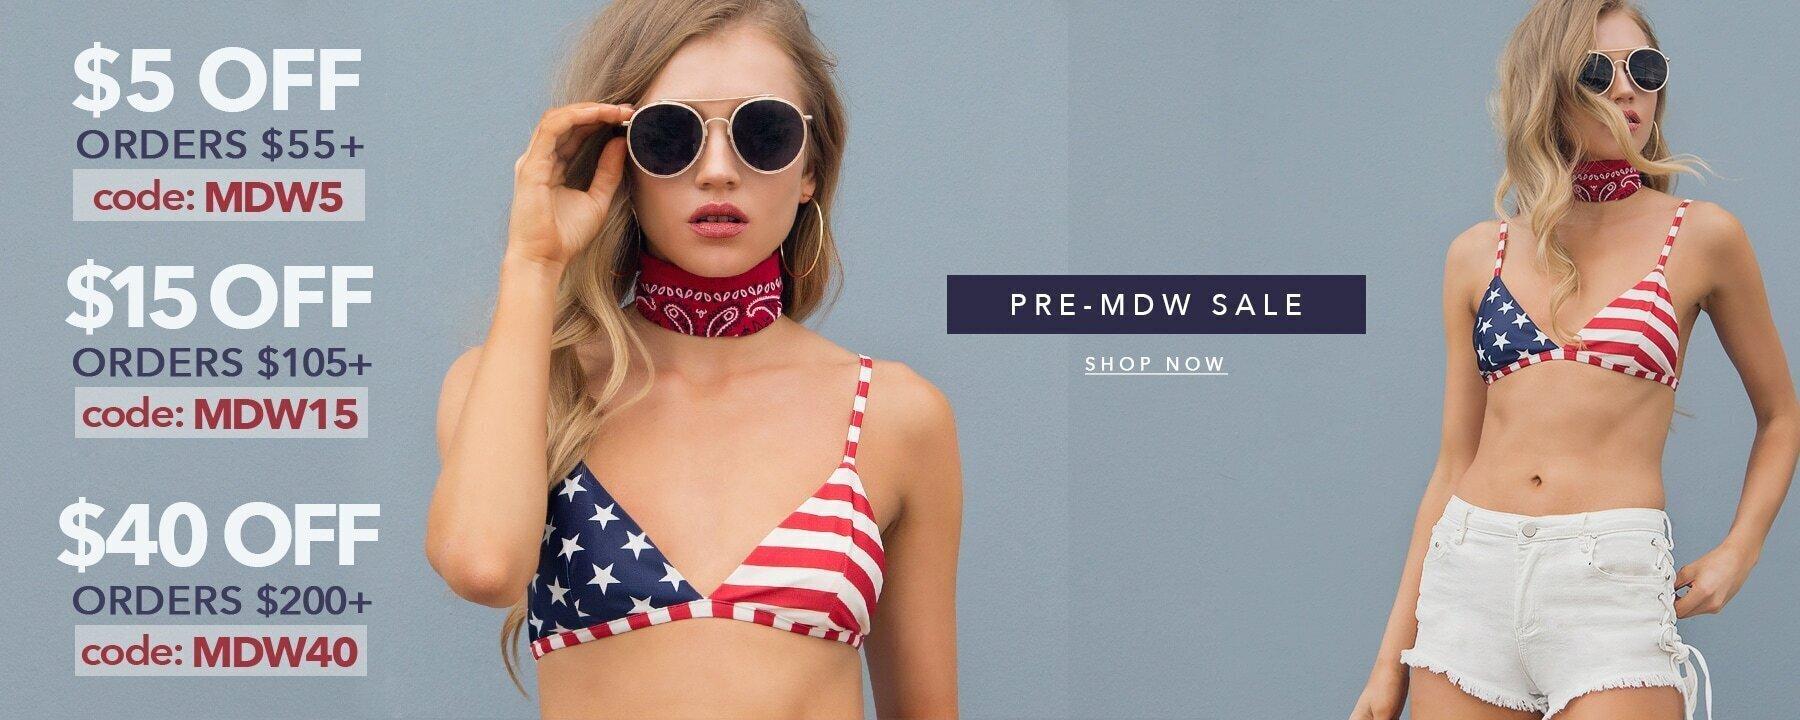 Pre-MDW Sale